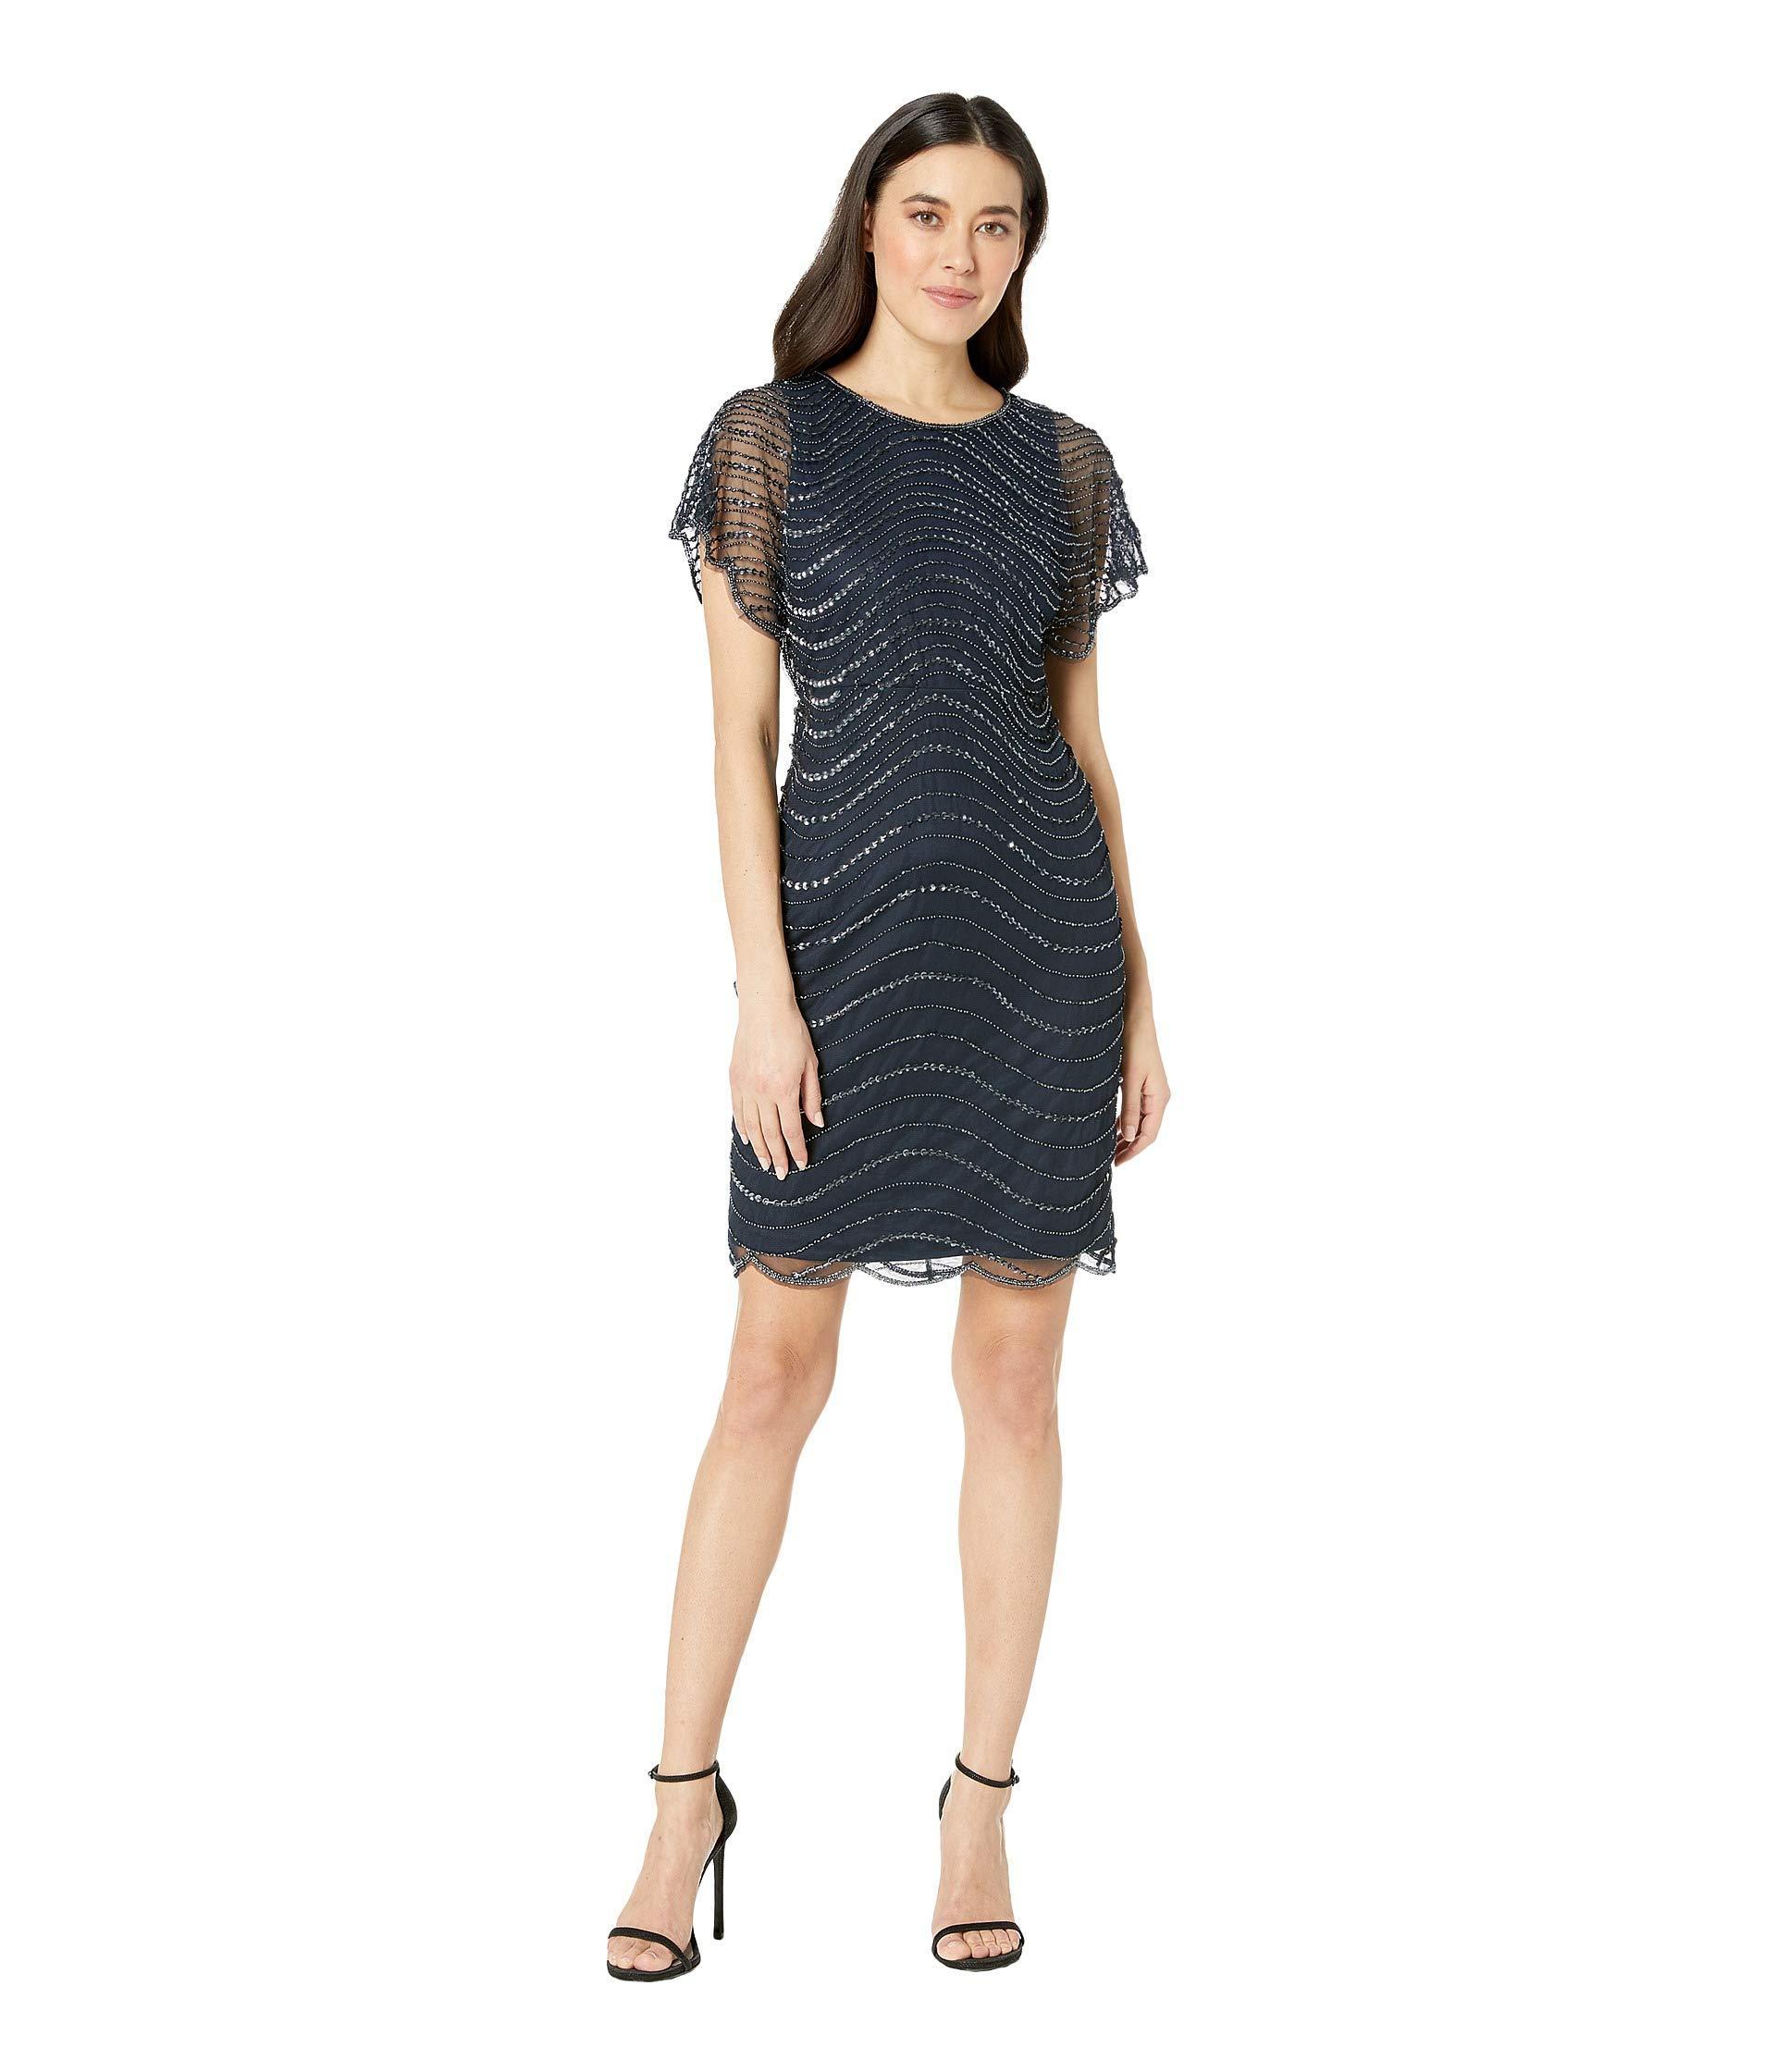 fc2e0db5 Lyst - Adrianna Papell Petite Beaded Flounce Sleeve Short Dress ...